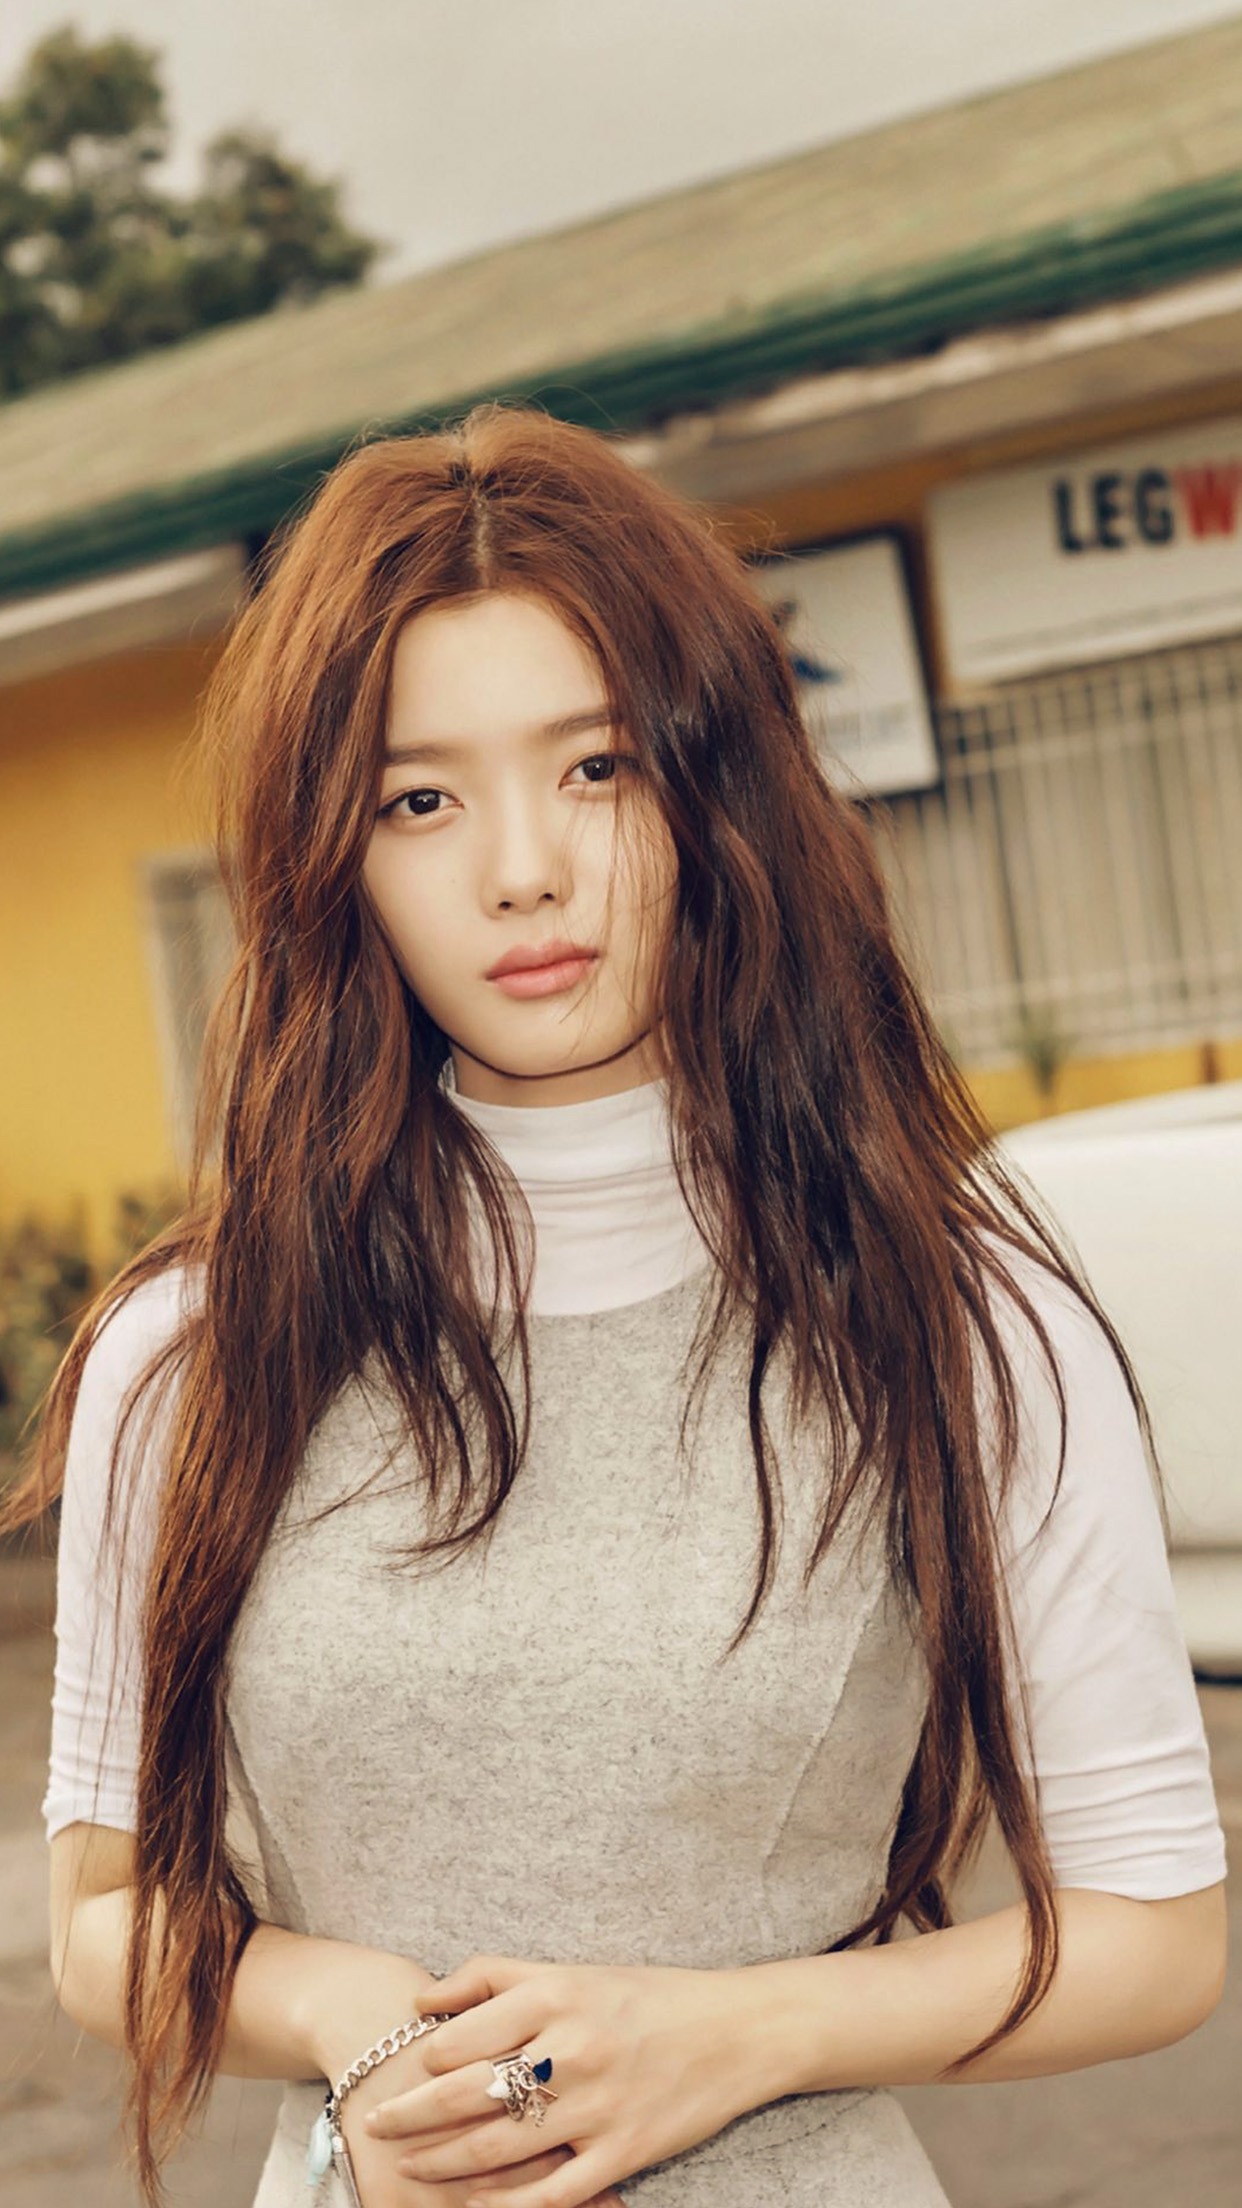 Hh49 Kim Yoo Jung Kpop Girl Cute Wallpaper